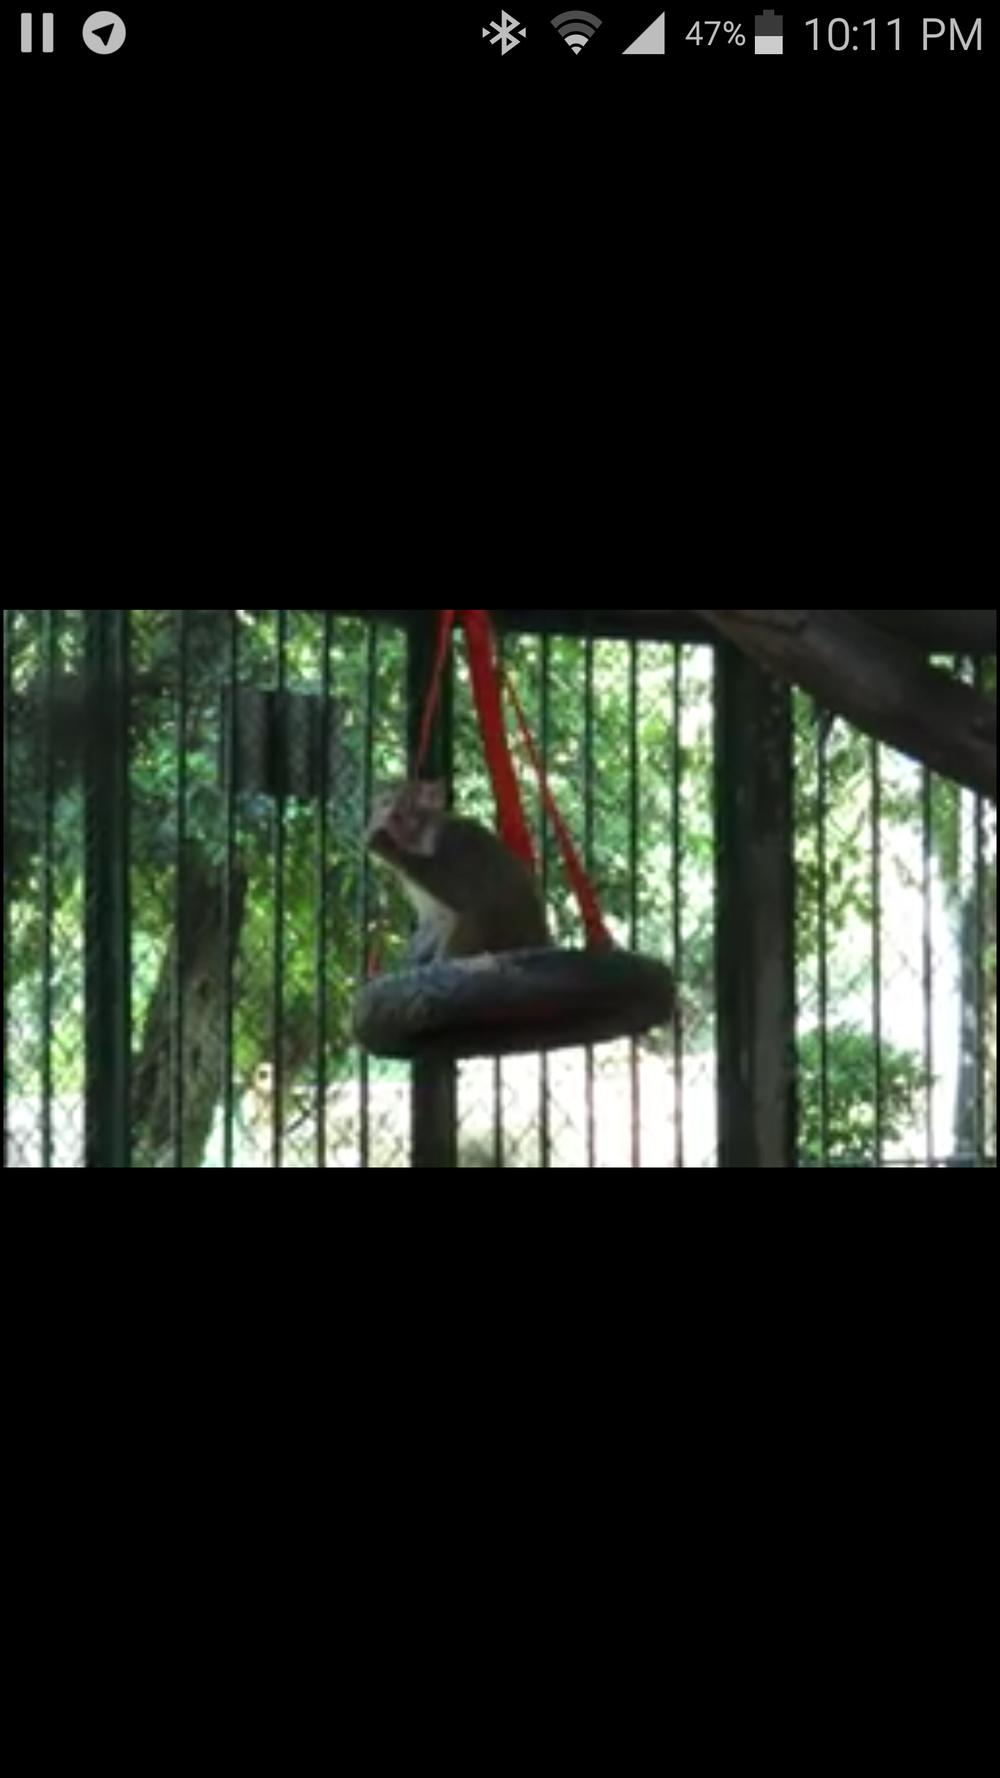 ibb zoo OWAPAR  Baboon swinging seats project 14 APRIL 2018 haitham.png